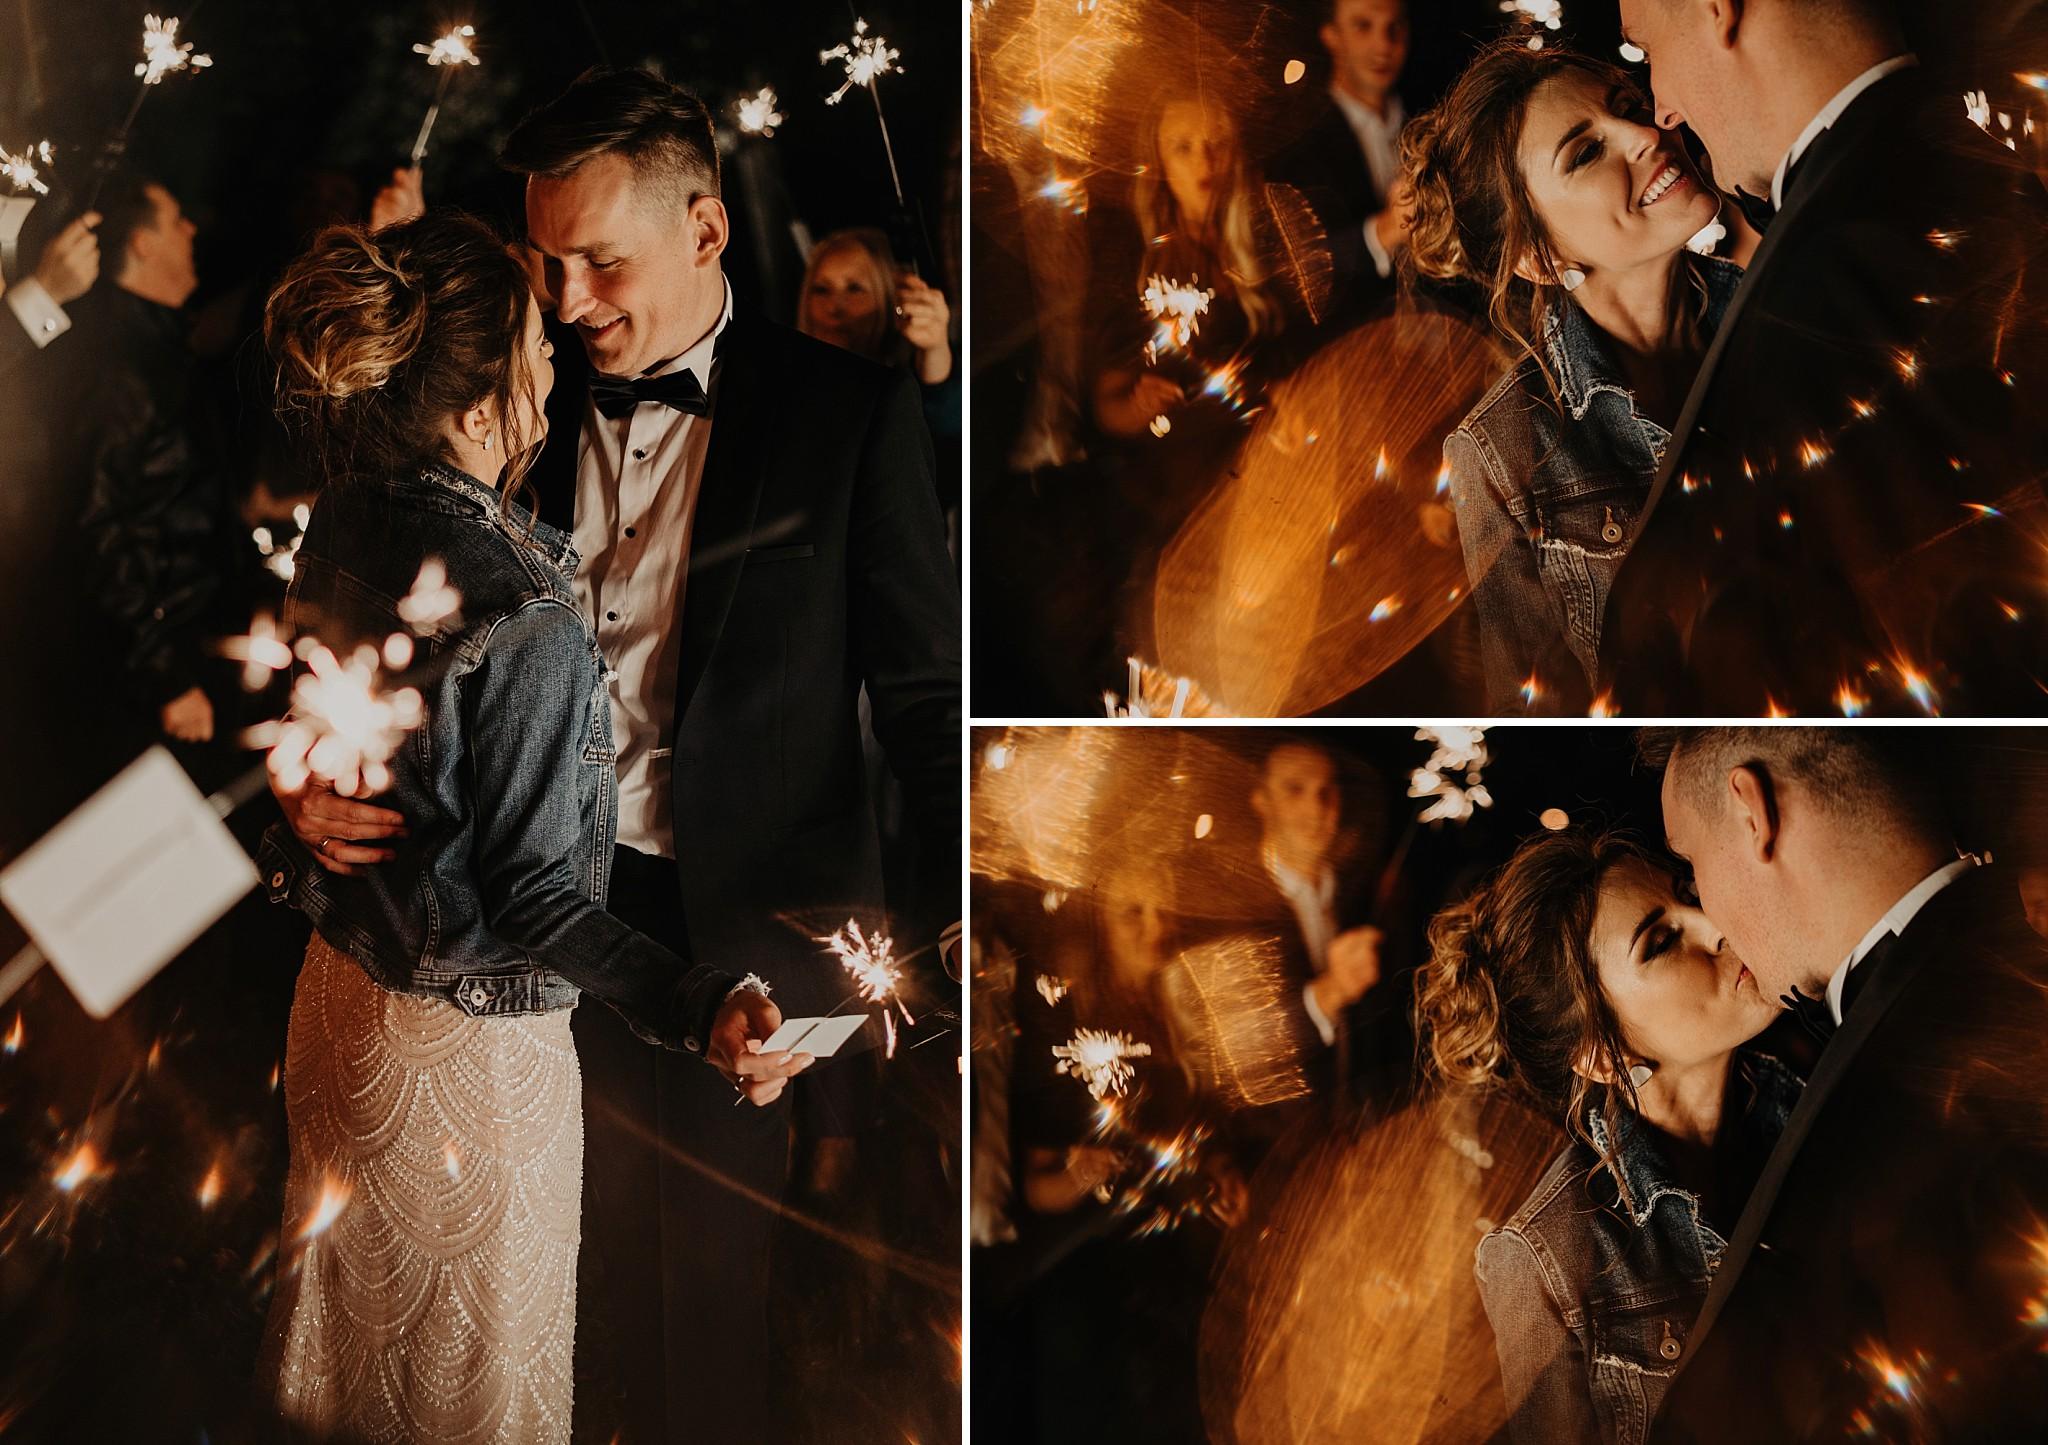 fotograf poznan wesele dobra truskawka piekne wesele pod poznaniem wesele w dobrej truskawce piekna para mloda slub marzen slub koronawirus slub listopad wesele koronawirus 505